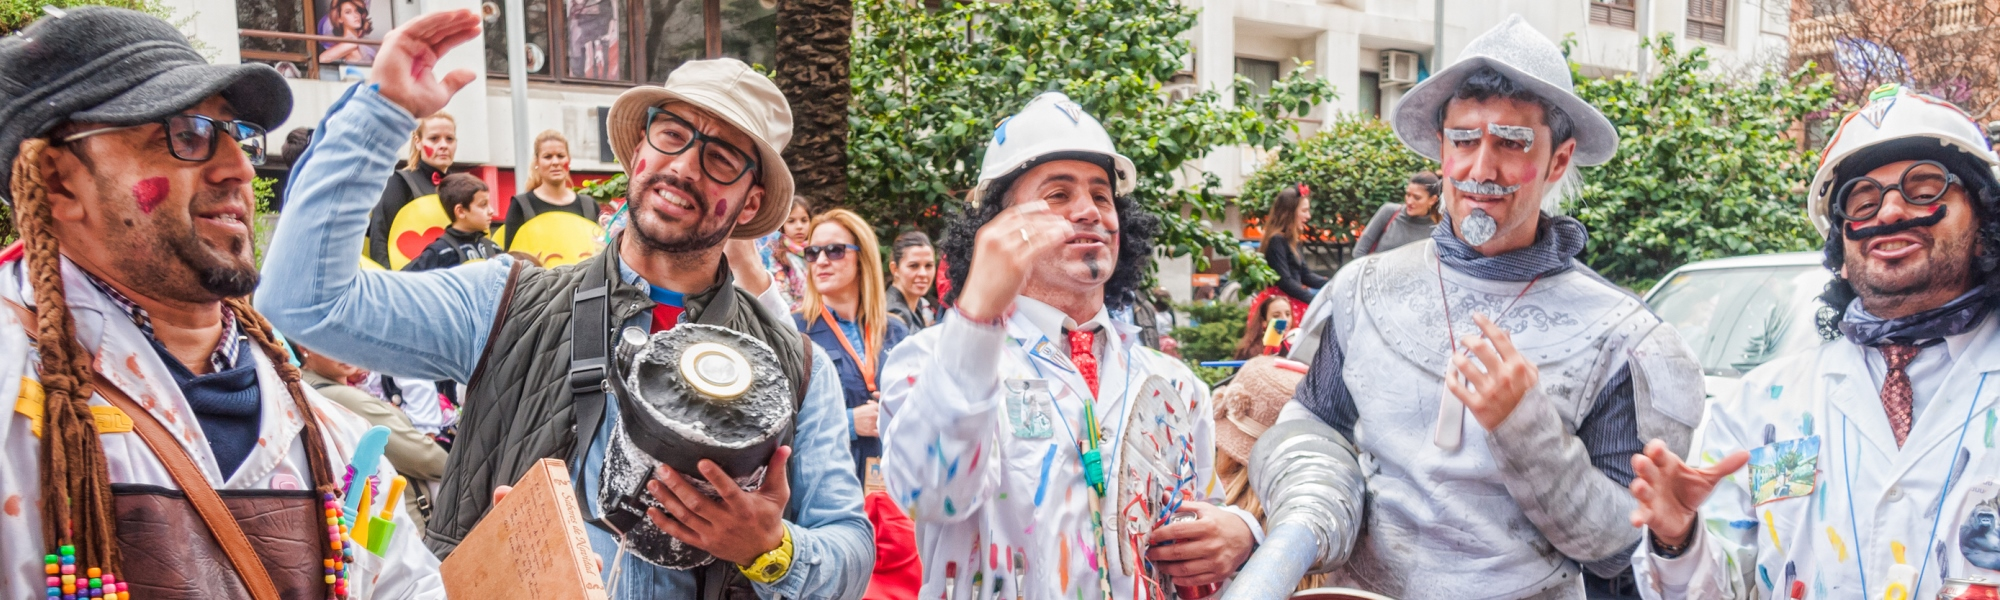 Carnaval de Cadis